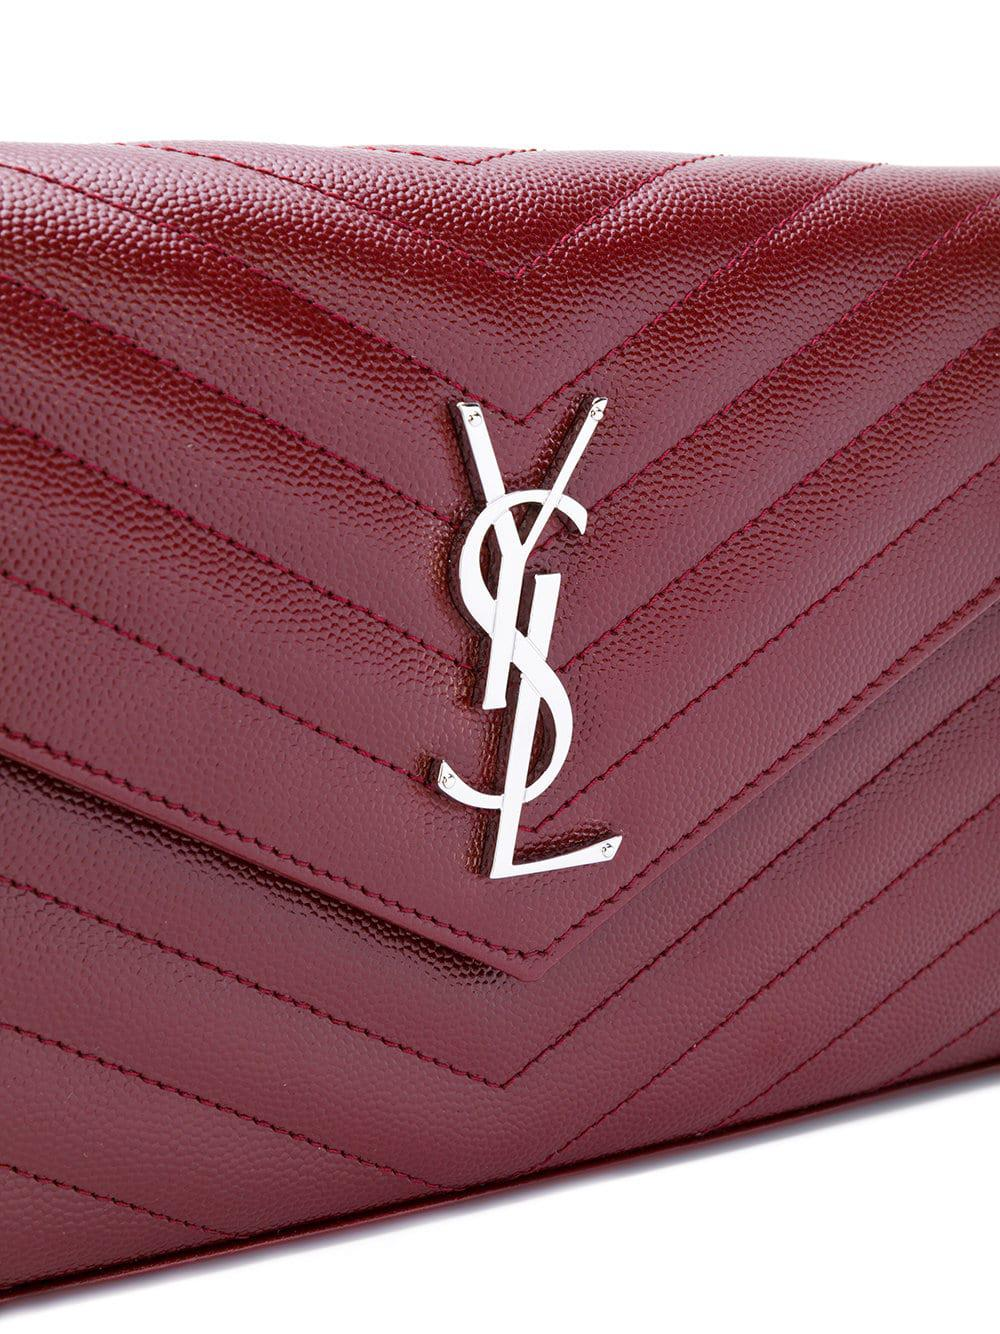 67cc6baa28 Lyst - Saint Laurent Monogram Leather Envelope Bag in Pink